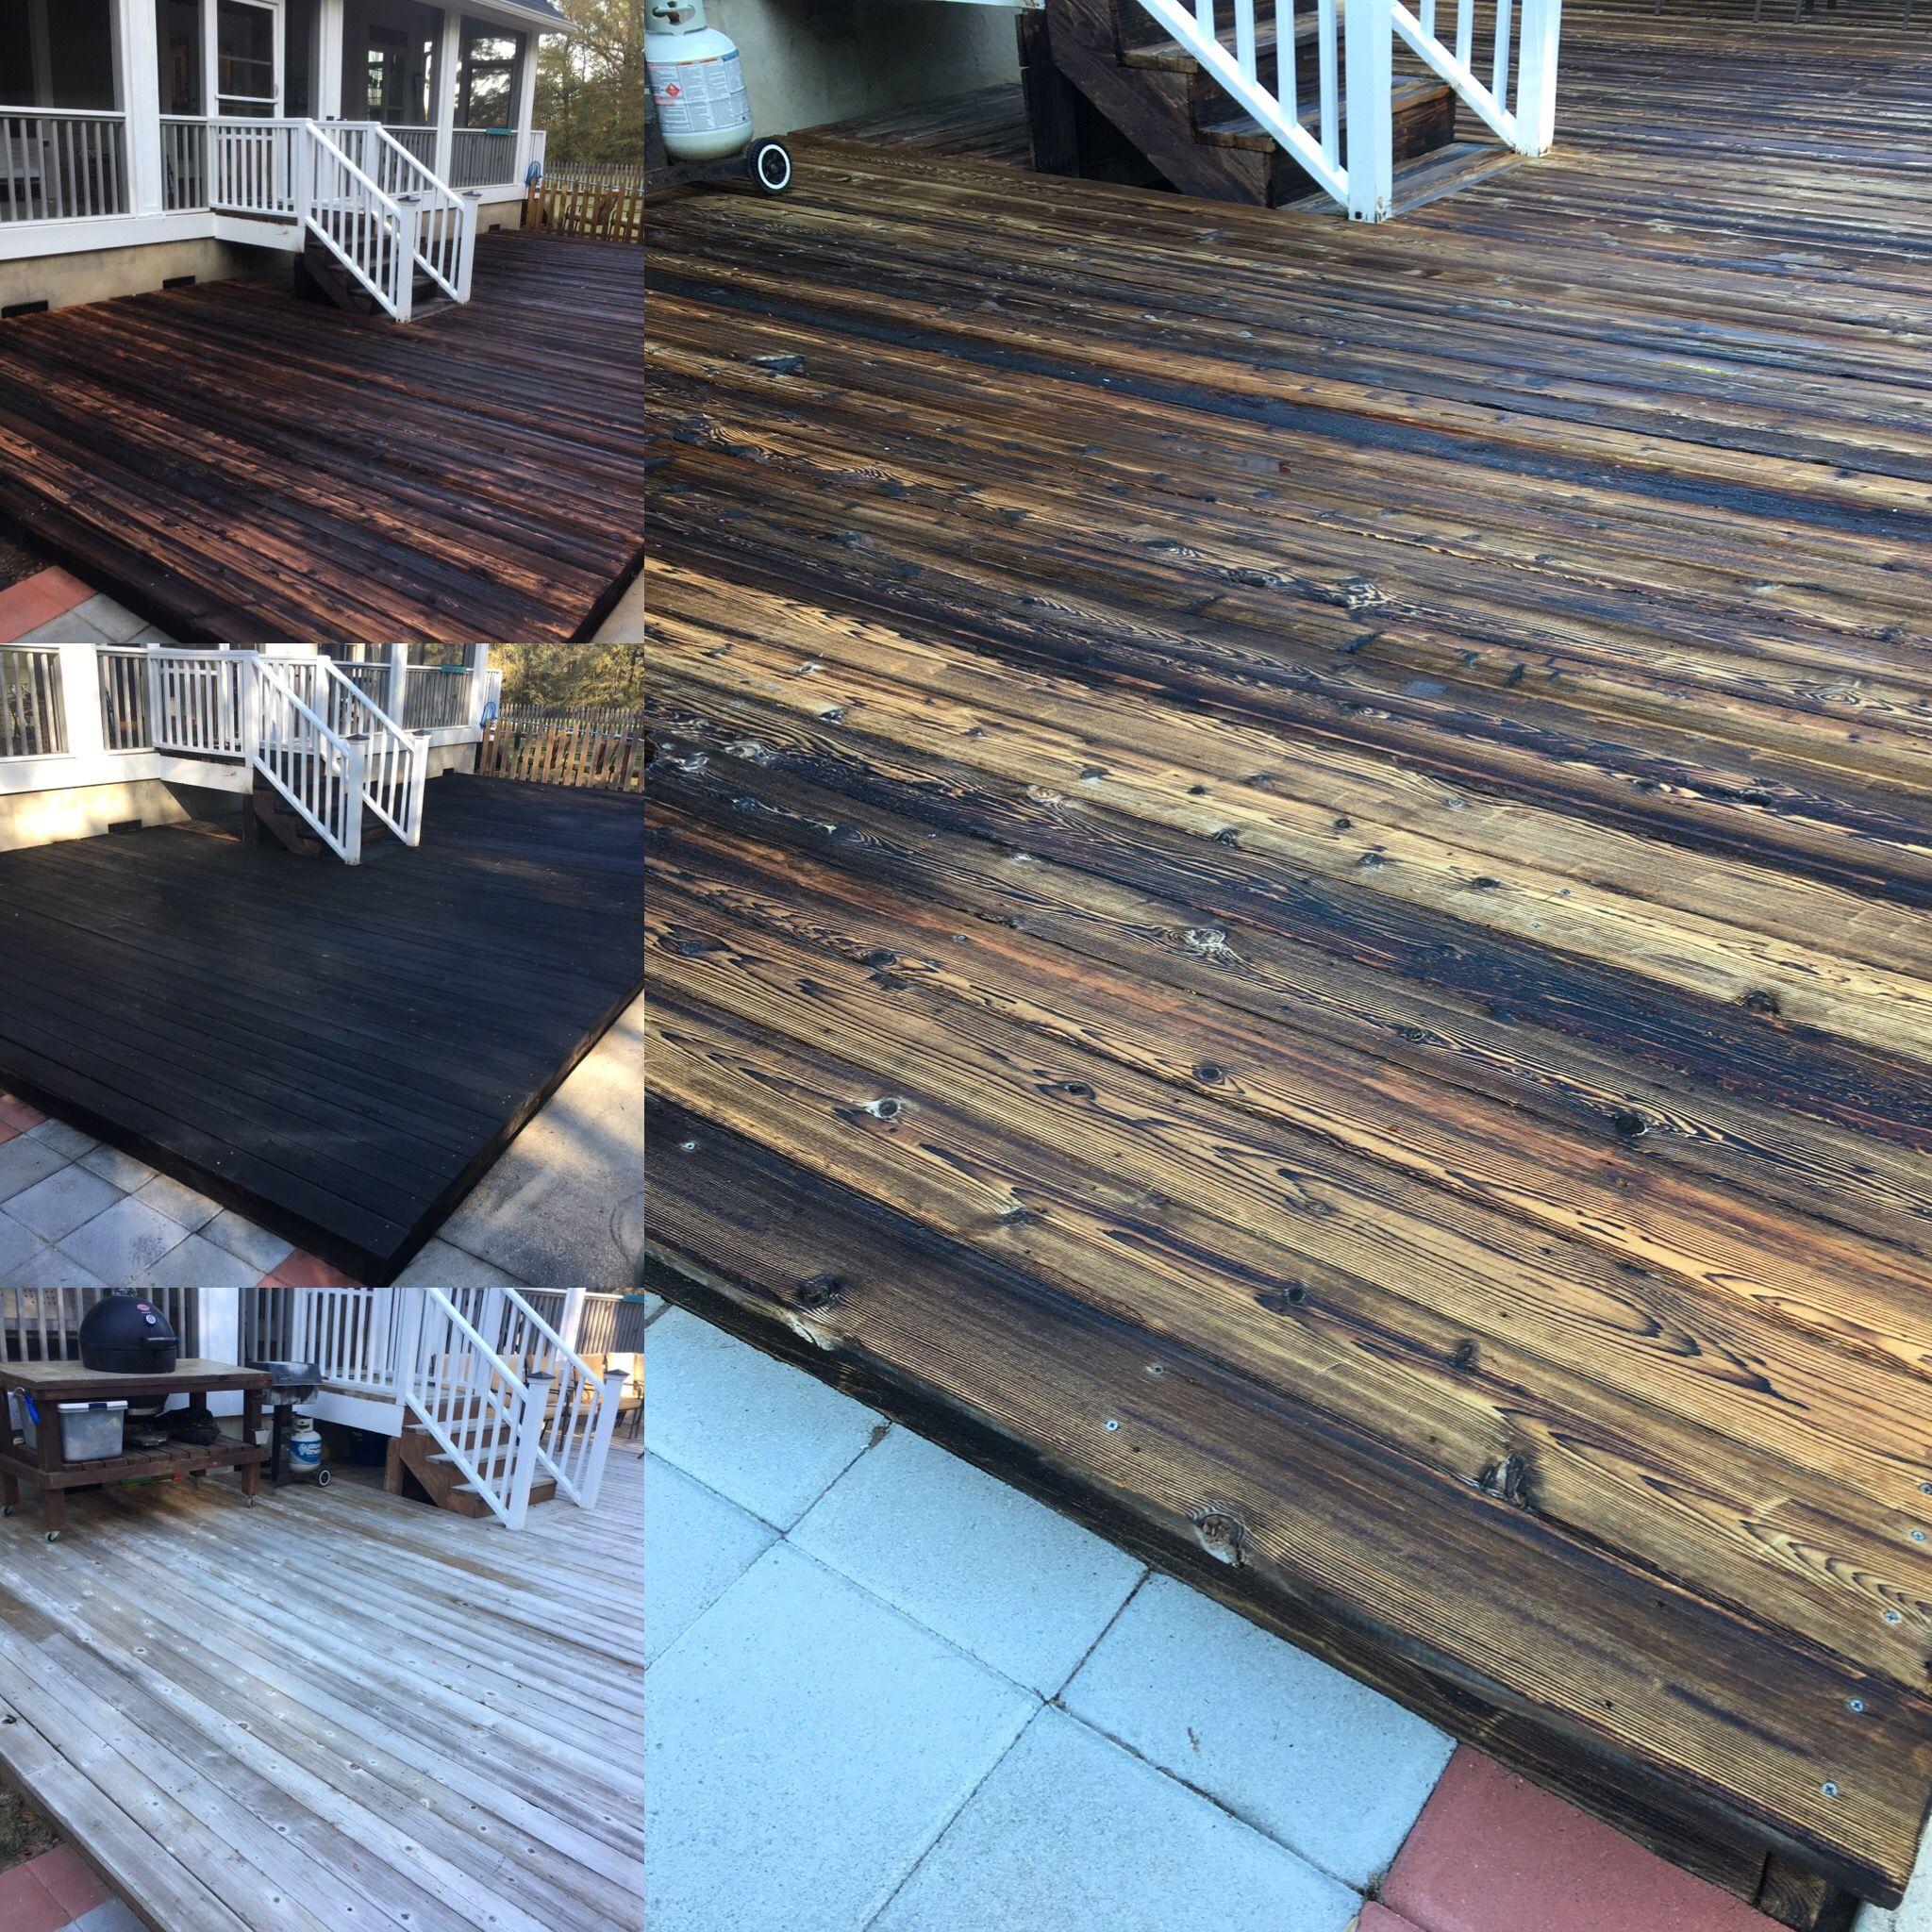 Shou Sugi Ban Yakisugi Deck Completed On 30 Year Old Cedar Wood